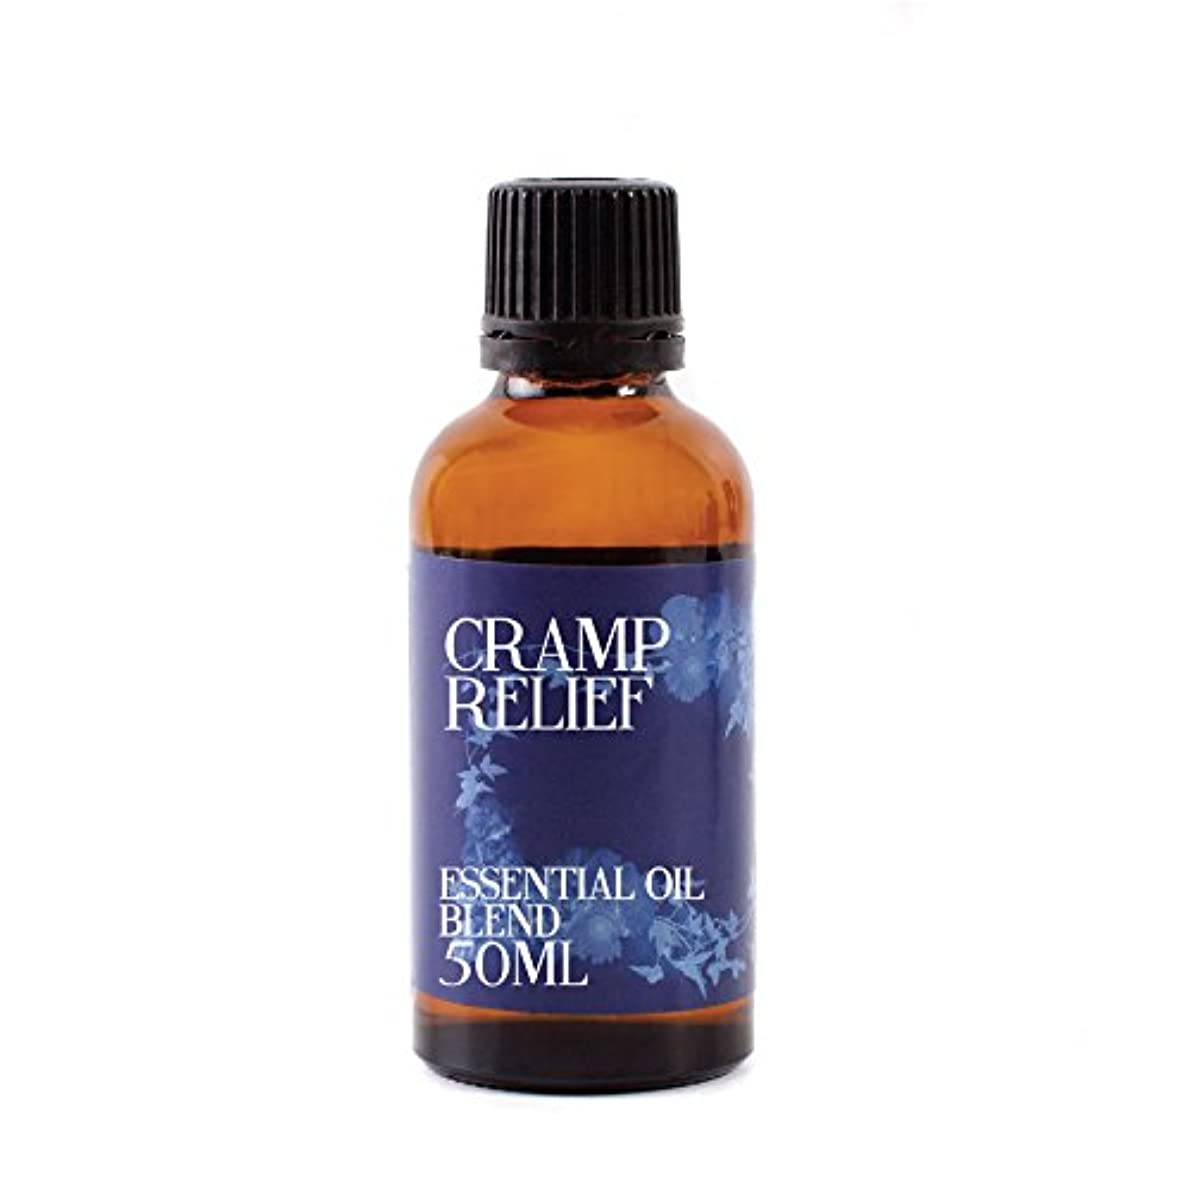 痴漢父方の腹部Mystix London | Cramp Relief Essential Oil Blend - 50ml - 100% Pure